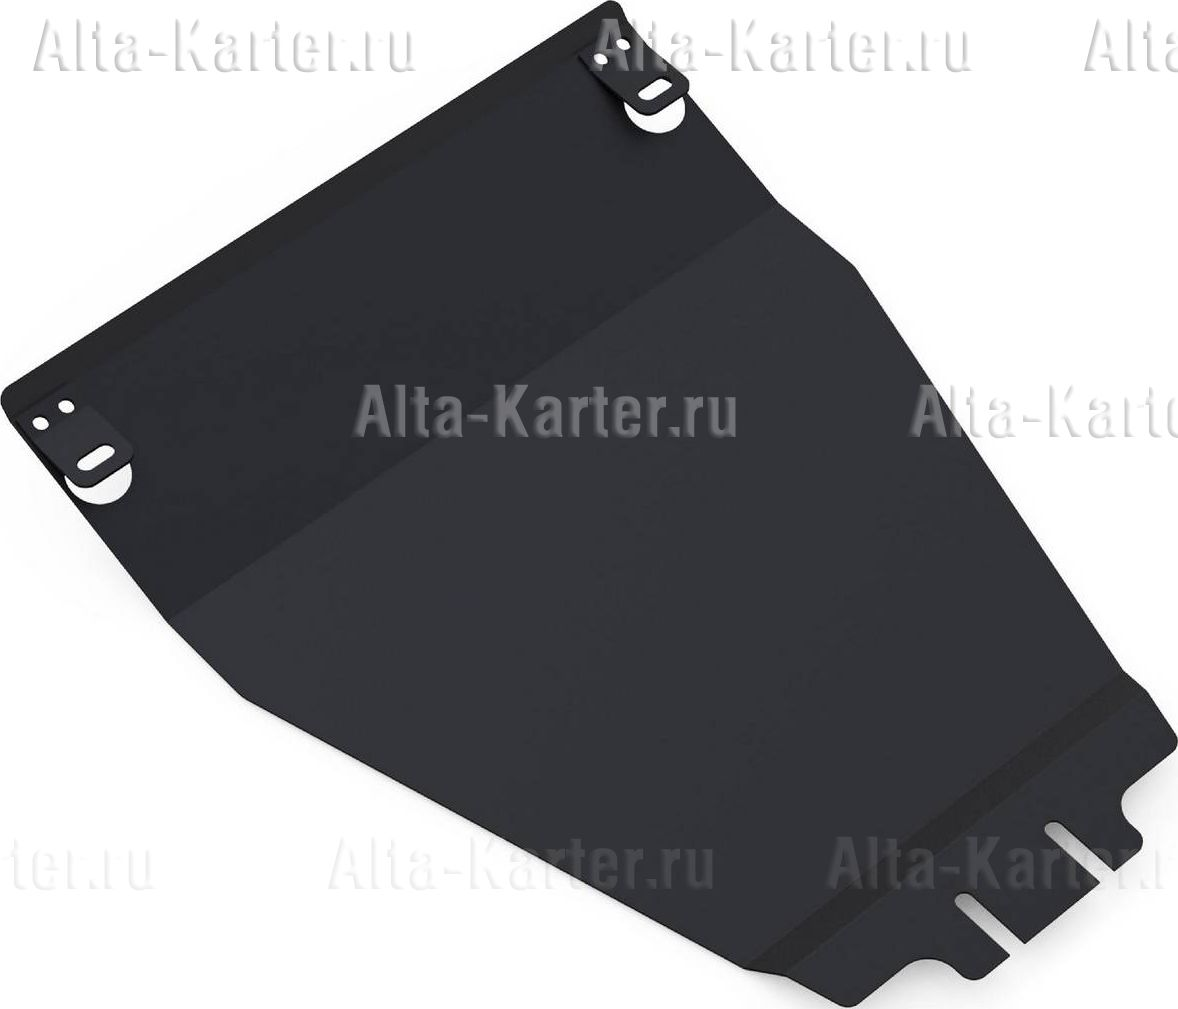 Защита Rival для картера Subaru Forester III 2008-2013. Артикул 111.5401.2